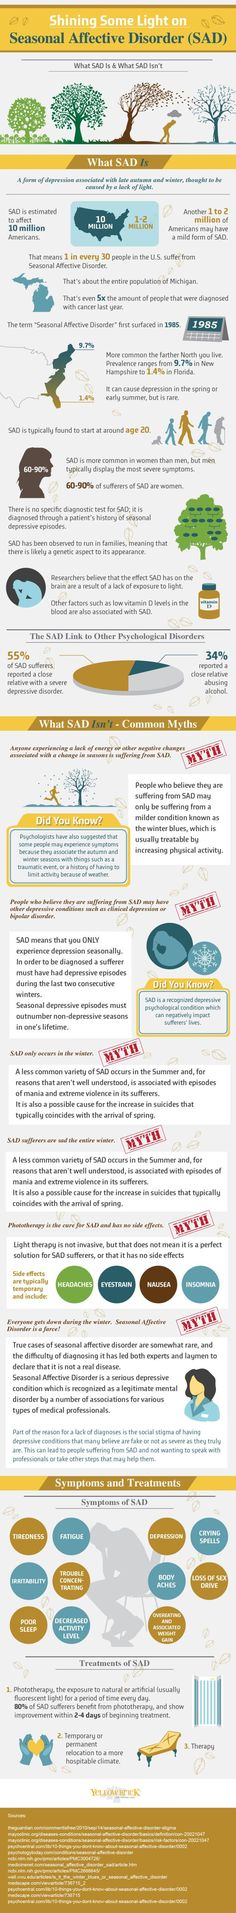 standard symptoms of seasonal affective disorder sad